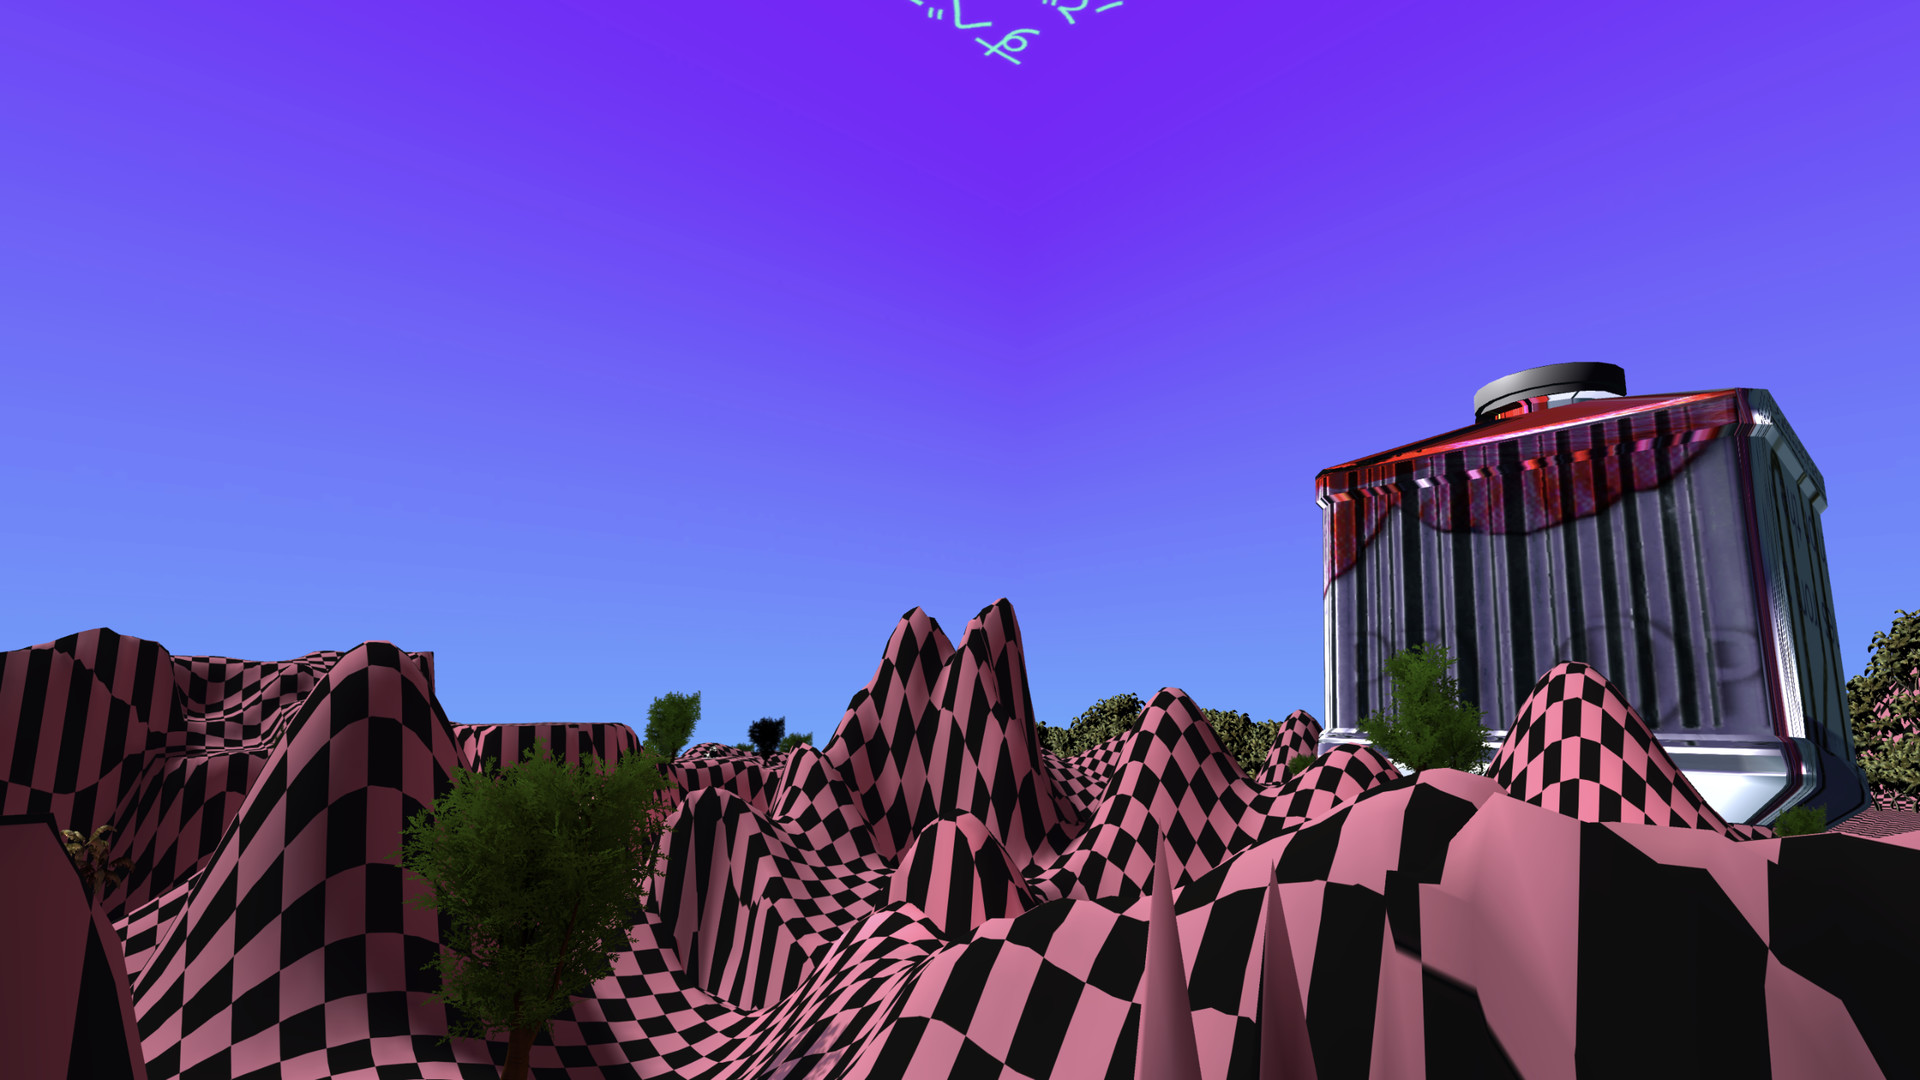 vaporwave simulator on steam